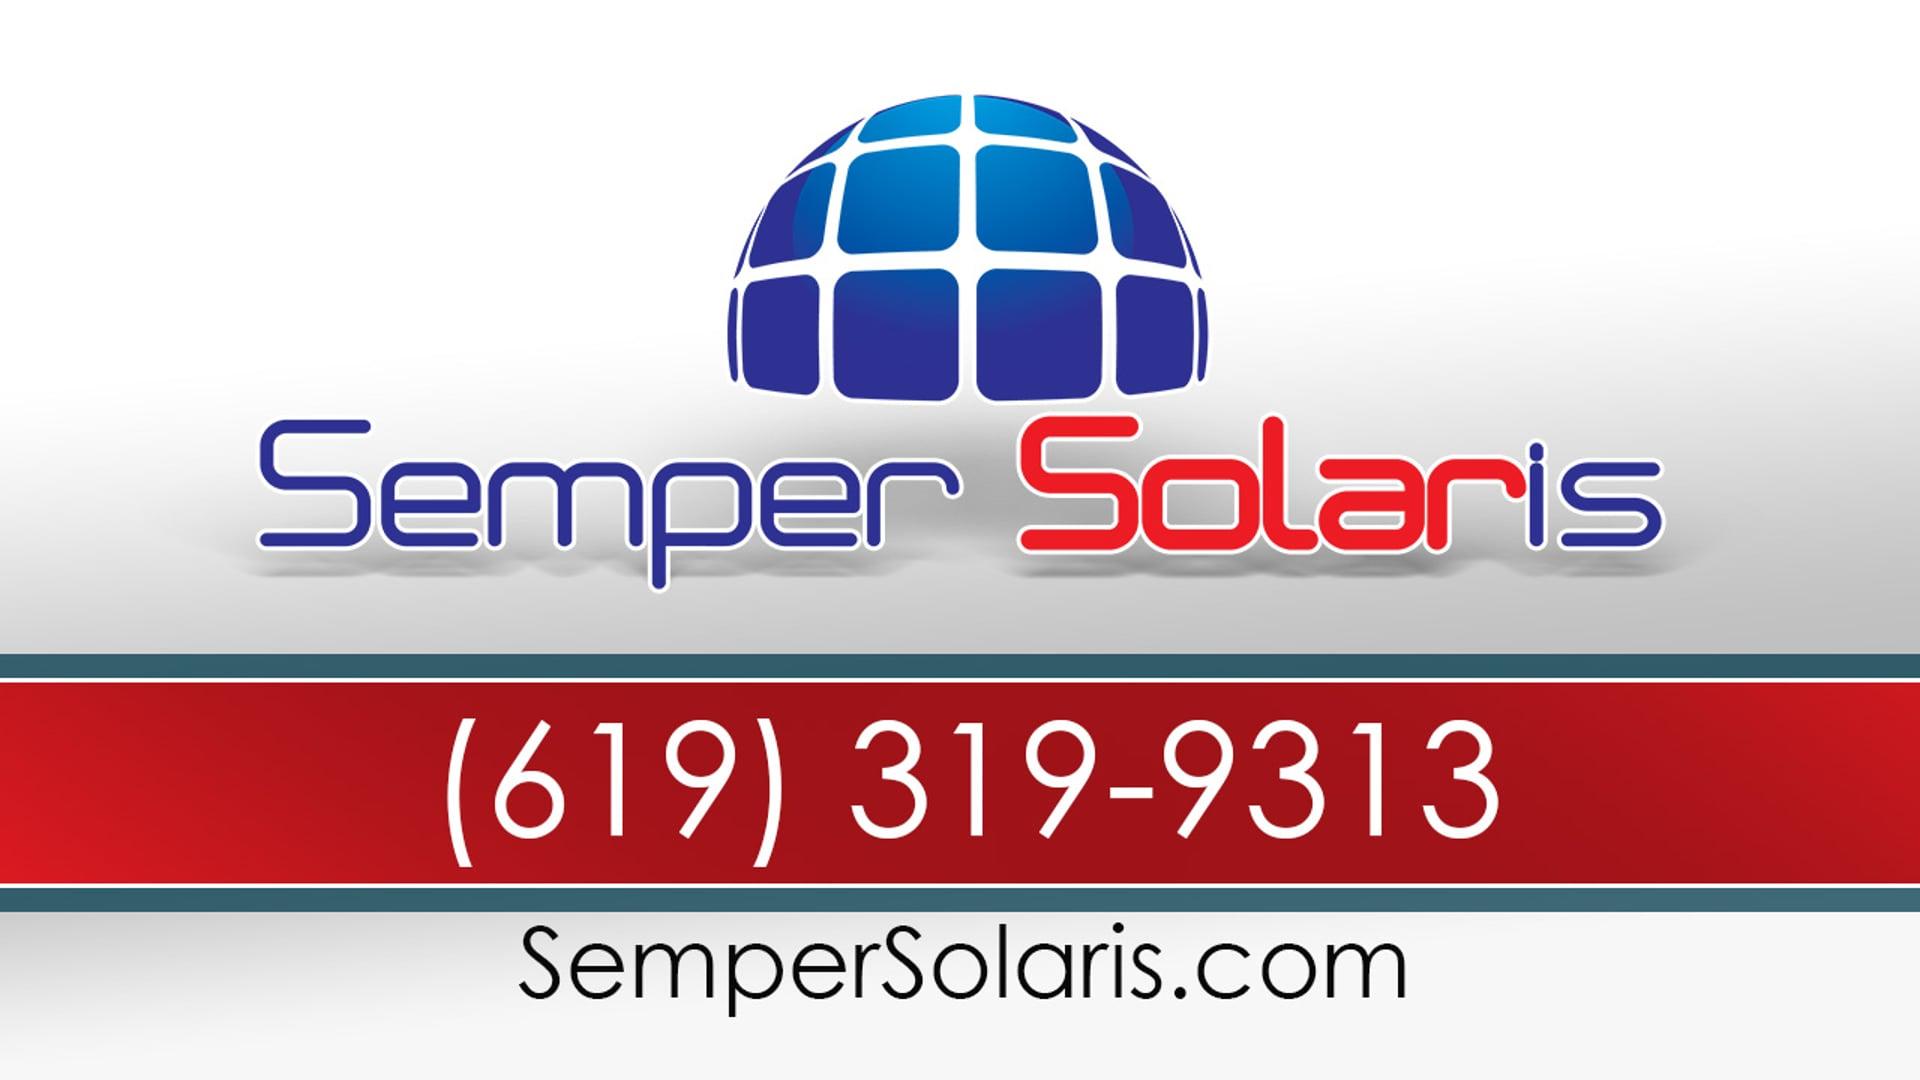 San Diego Solar Power Companies | Semper Solaris | (619) 319-9313